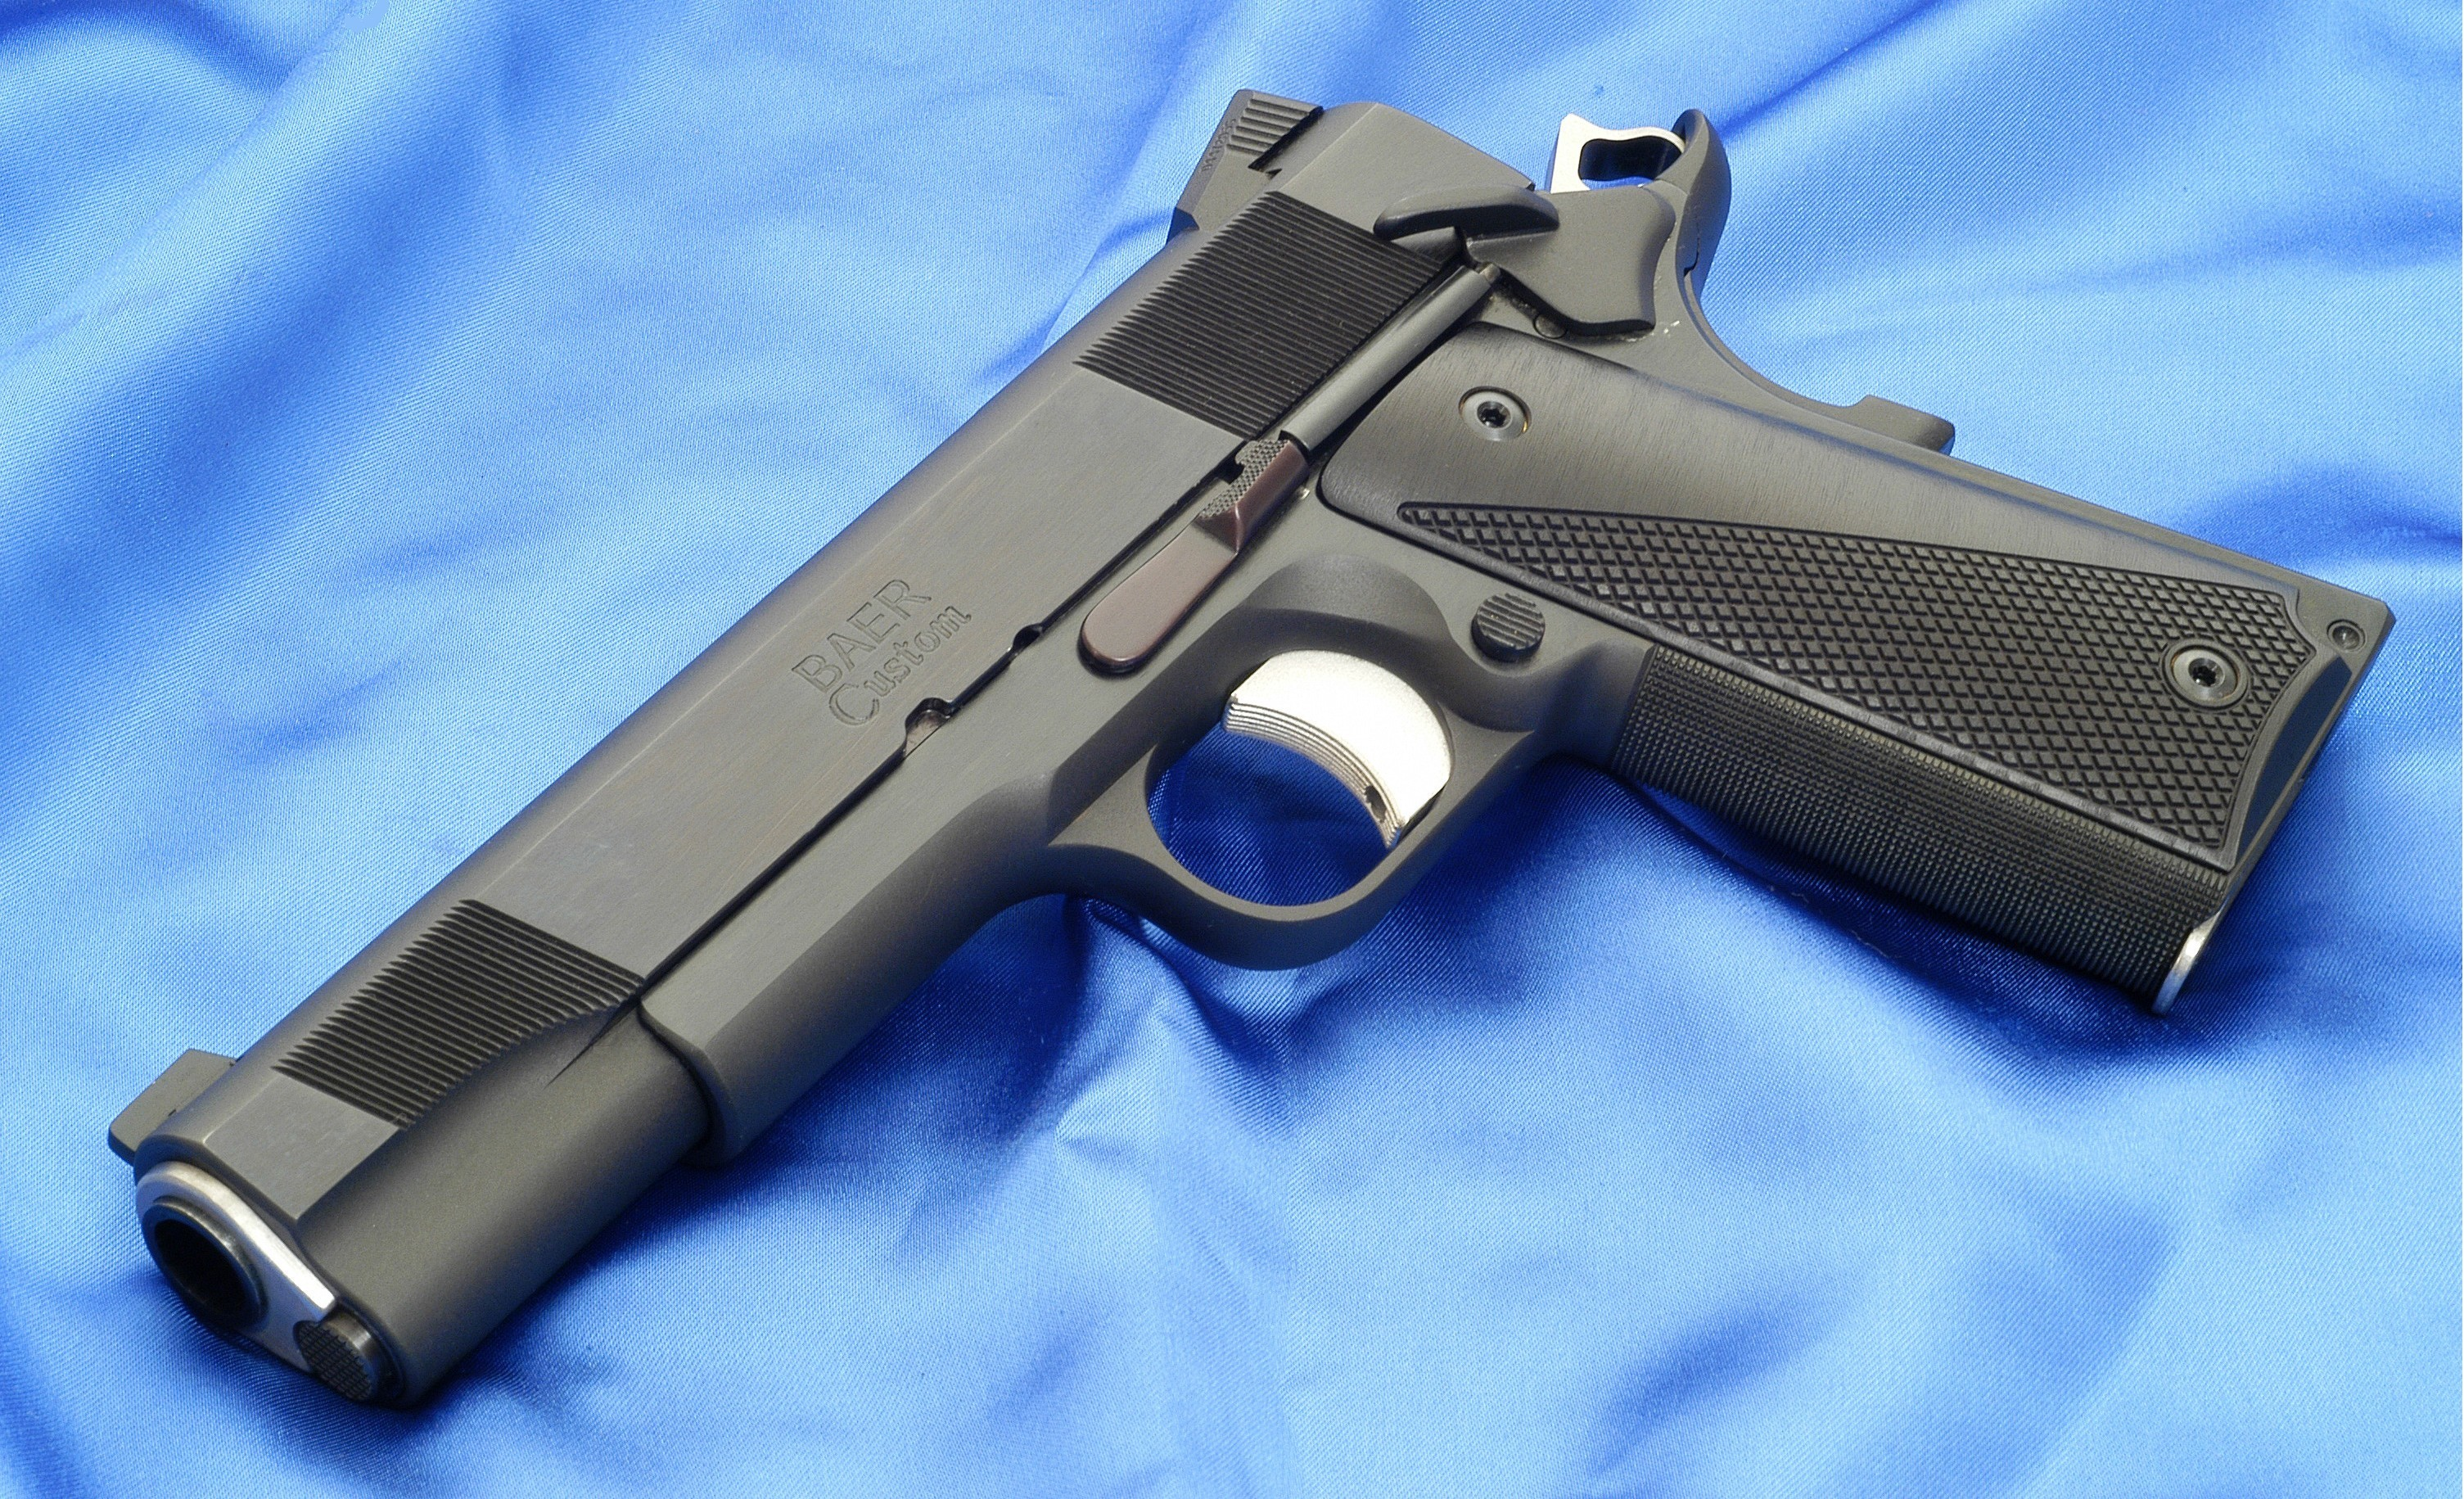 colt m1911 baer custom gun wallpaper colt m1911 gun guns black 3010x1831